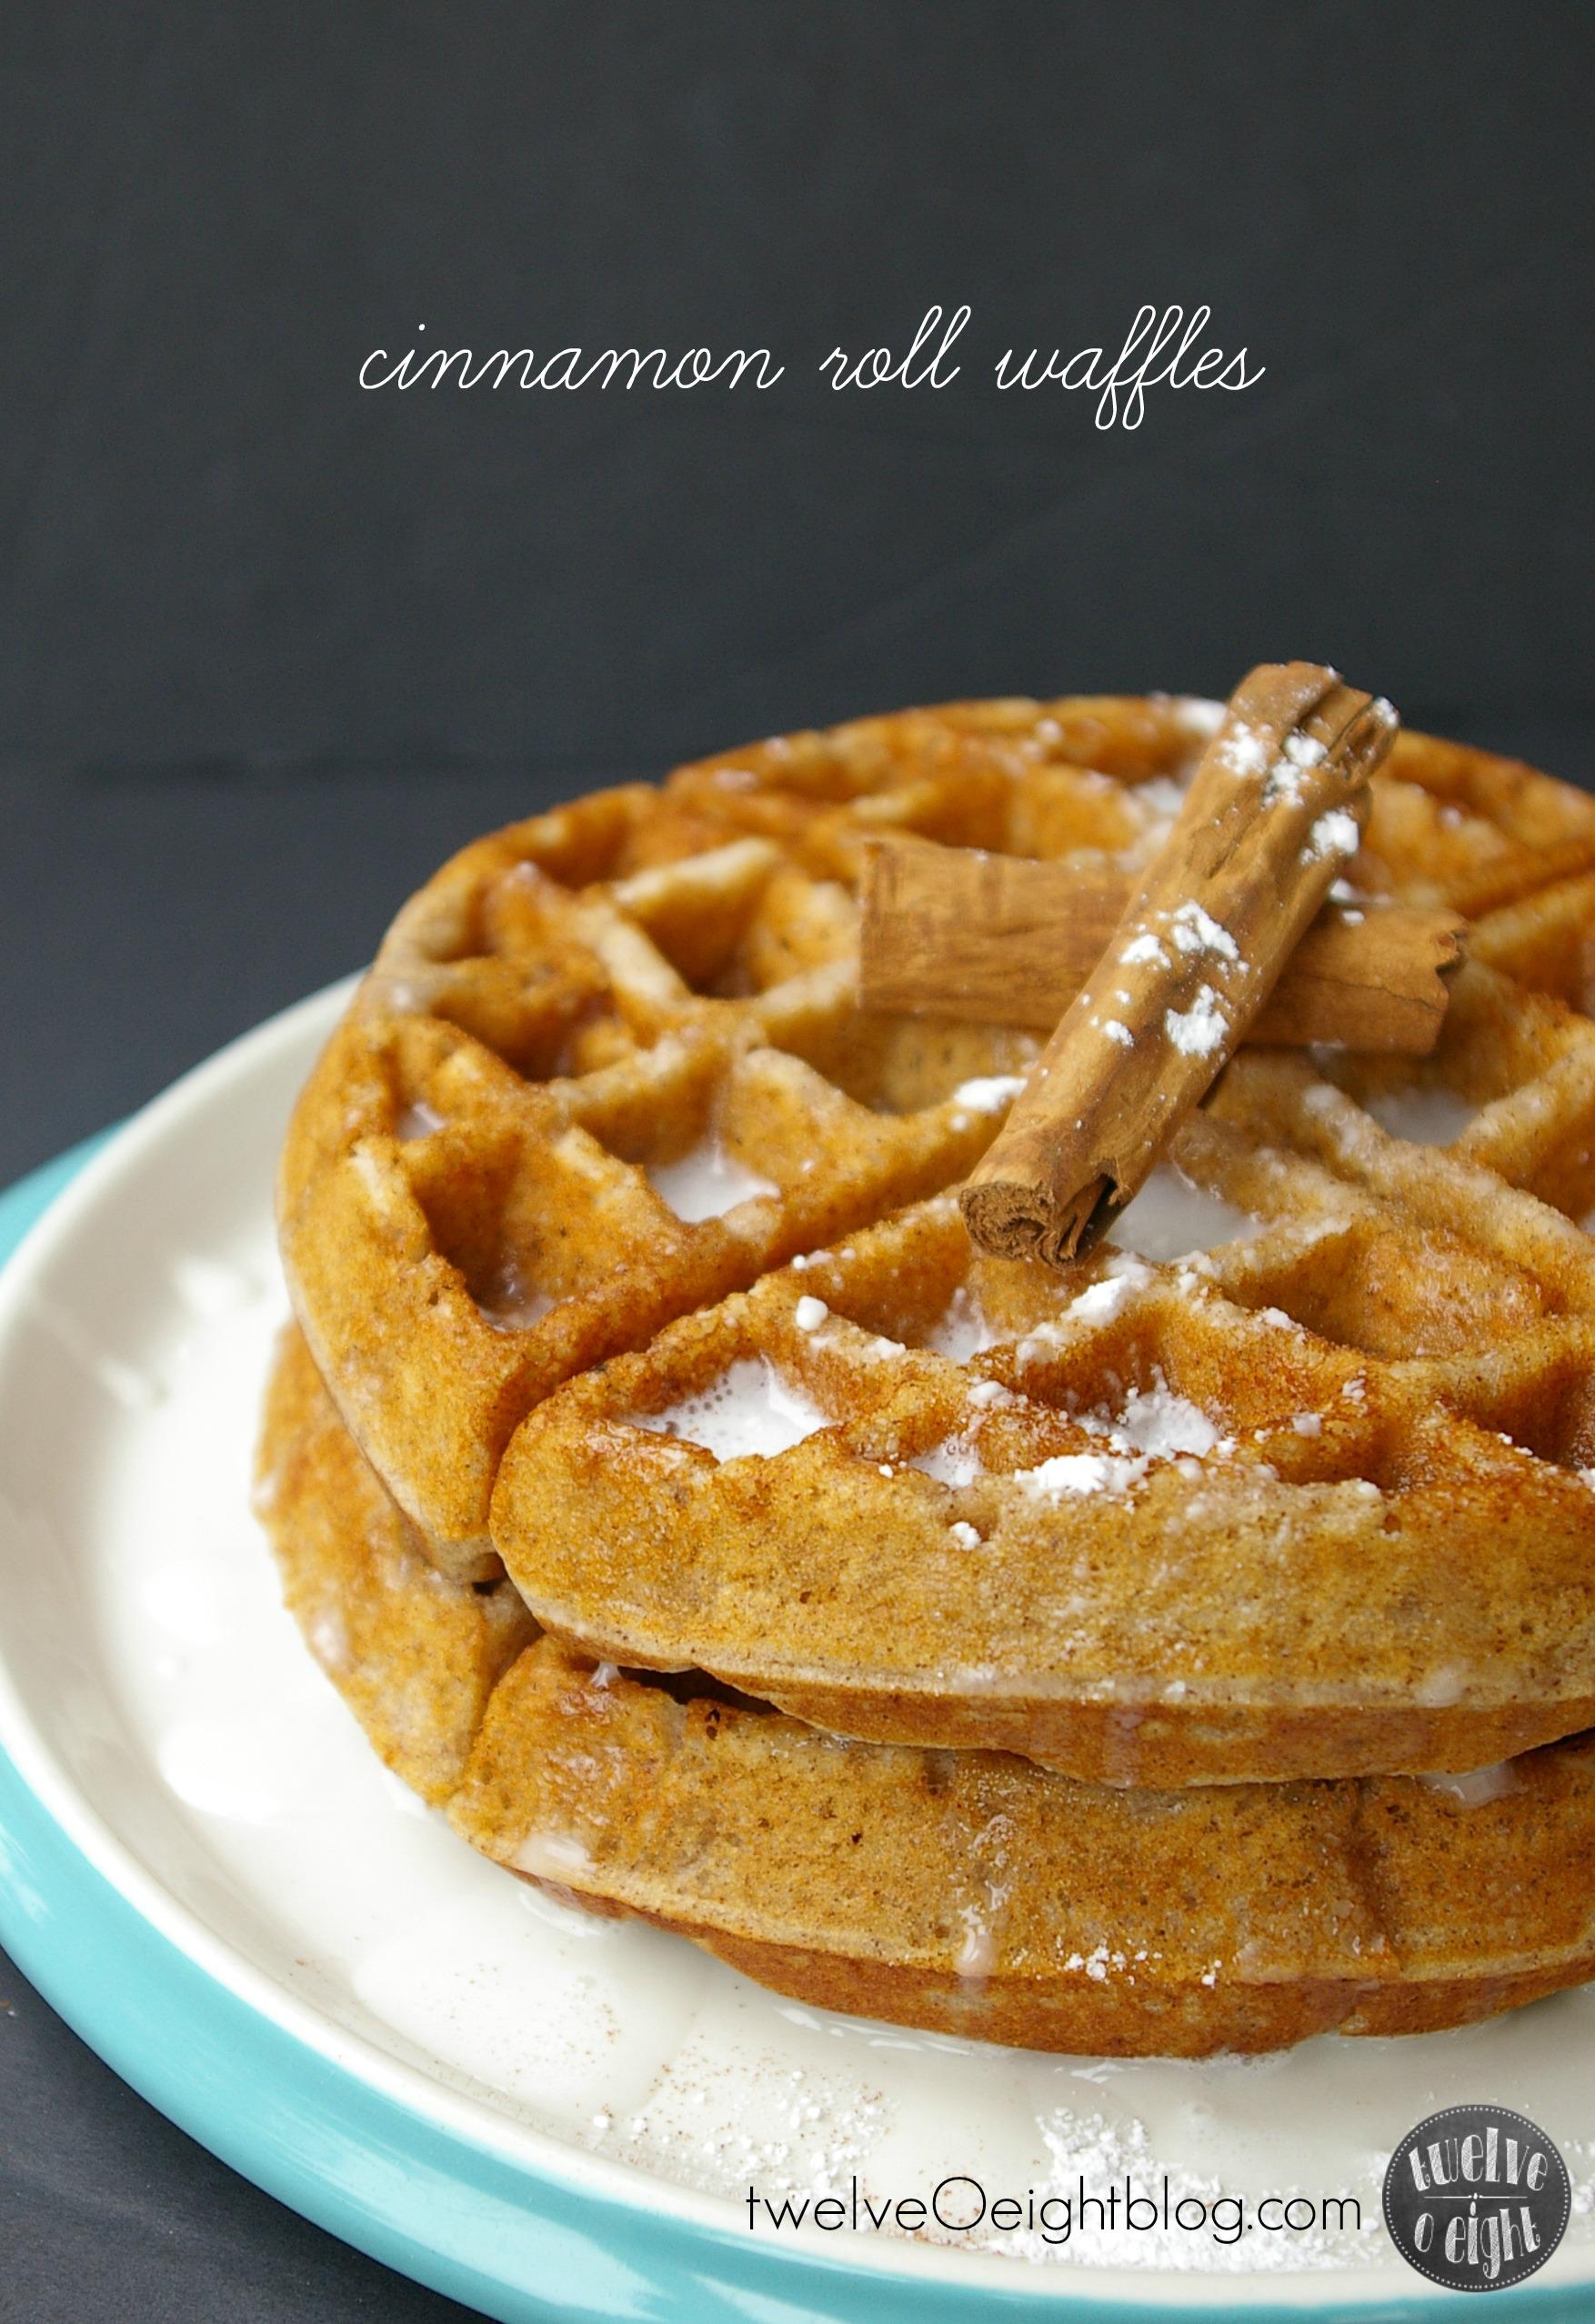 Cinnamon Roll Waffles twelveOeightblog.com #CinnamonRoll #Waffle # ...